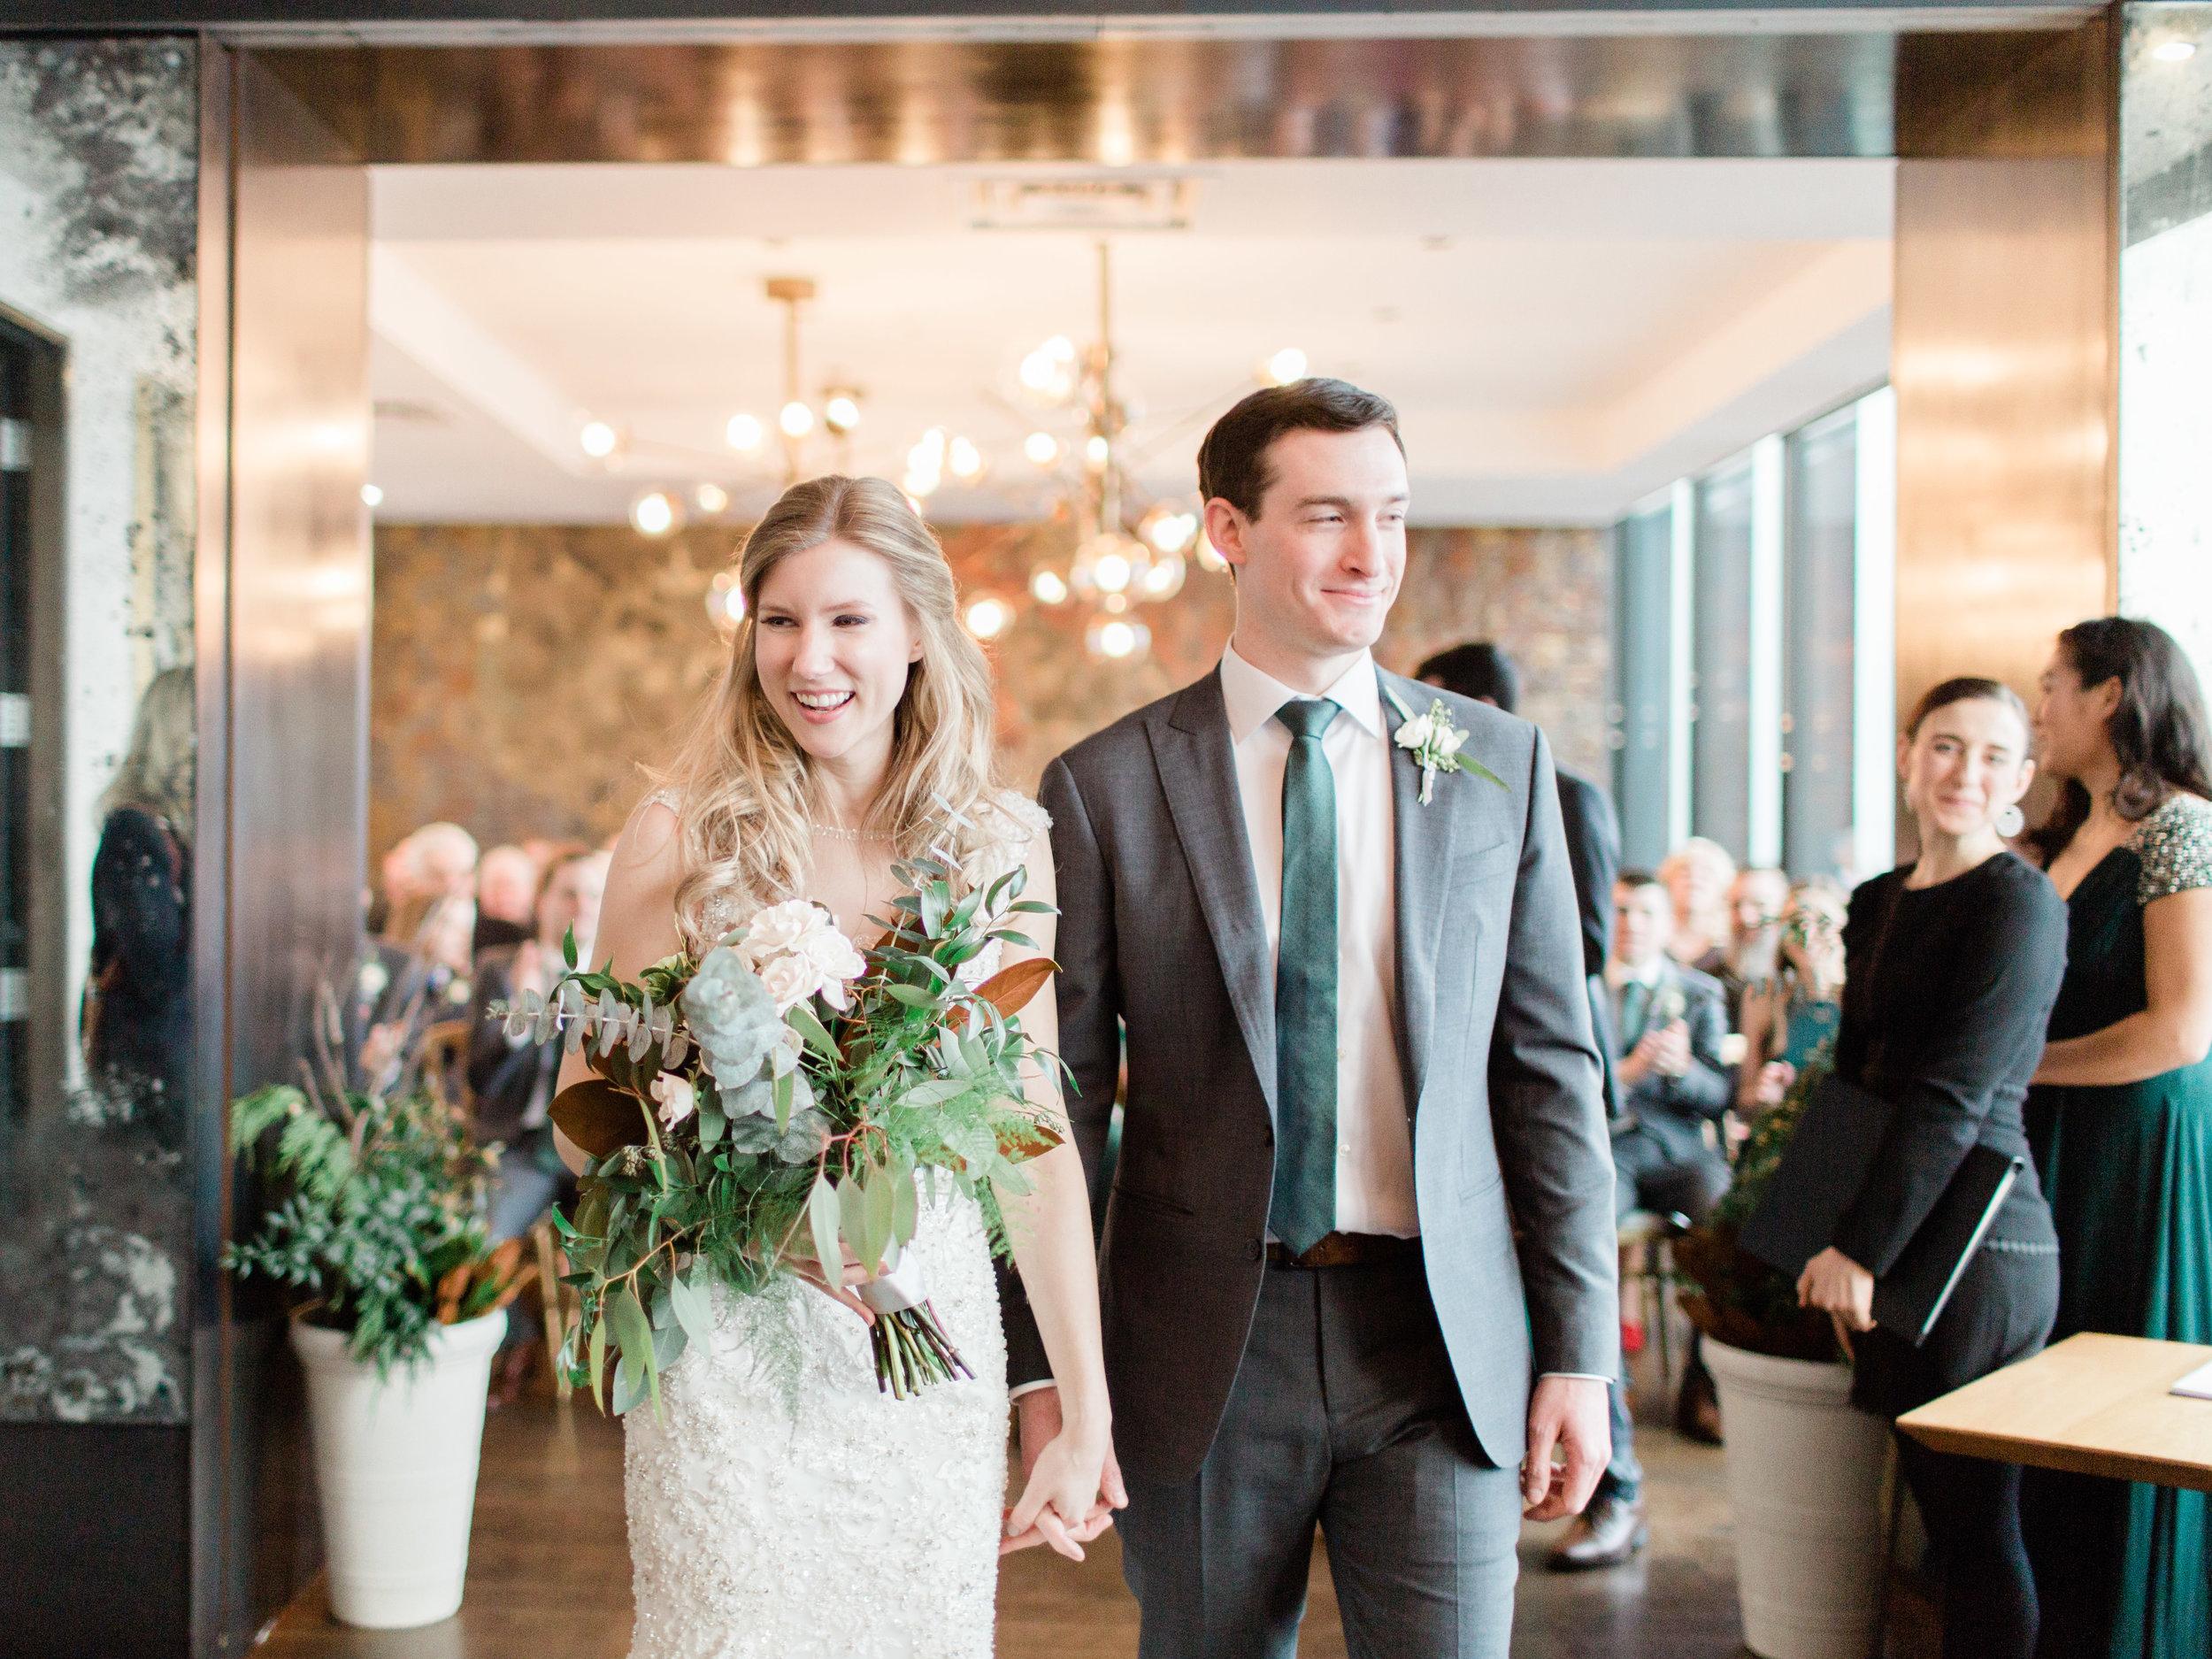 Toronto-wedding-photographer-downtown-winter-wedding-intimate-restaurant-canoe150.jpg